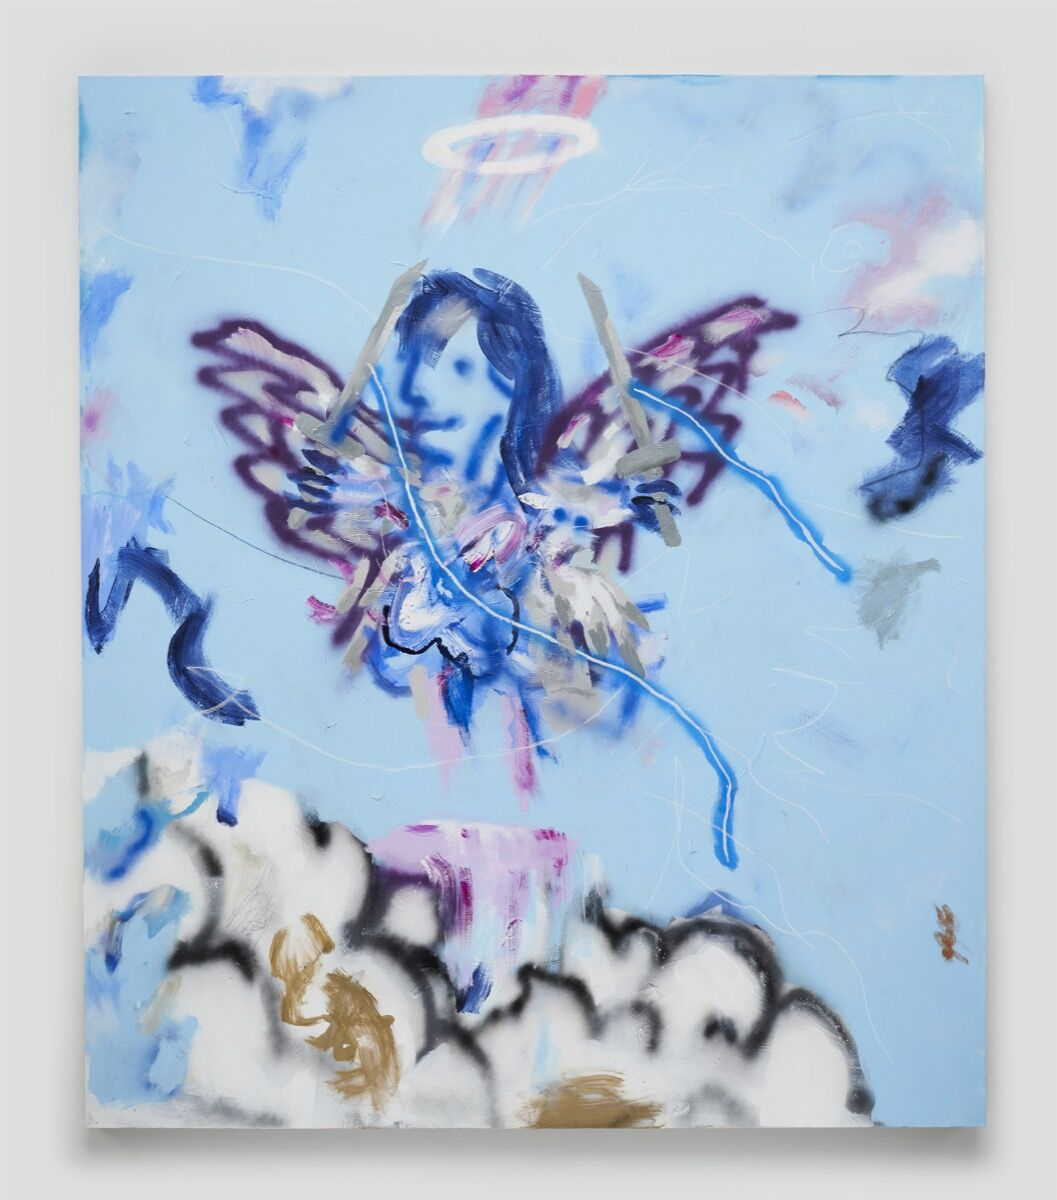 Robert Nava, Cloud Rider Angel, 2020. © Robert Nava. Courtesy of the artist and Vito Schnabel Gallery.